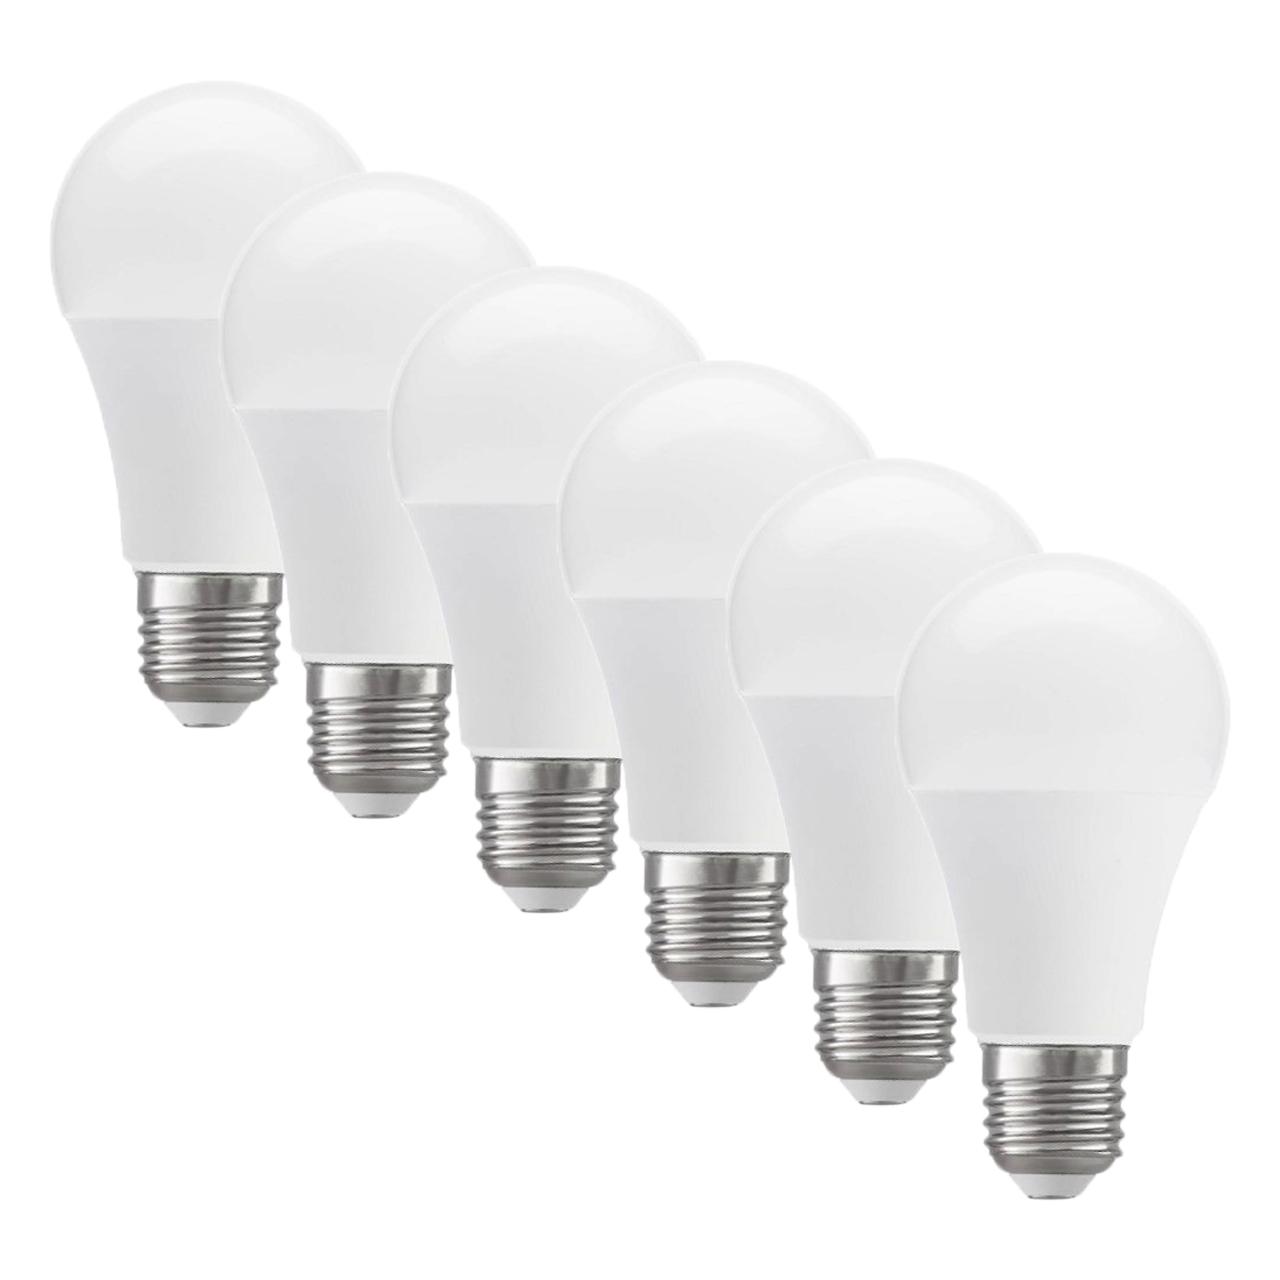 لامپ ال ای دی 15 وات مونلایت پایه E27 بسته 6 عددی